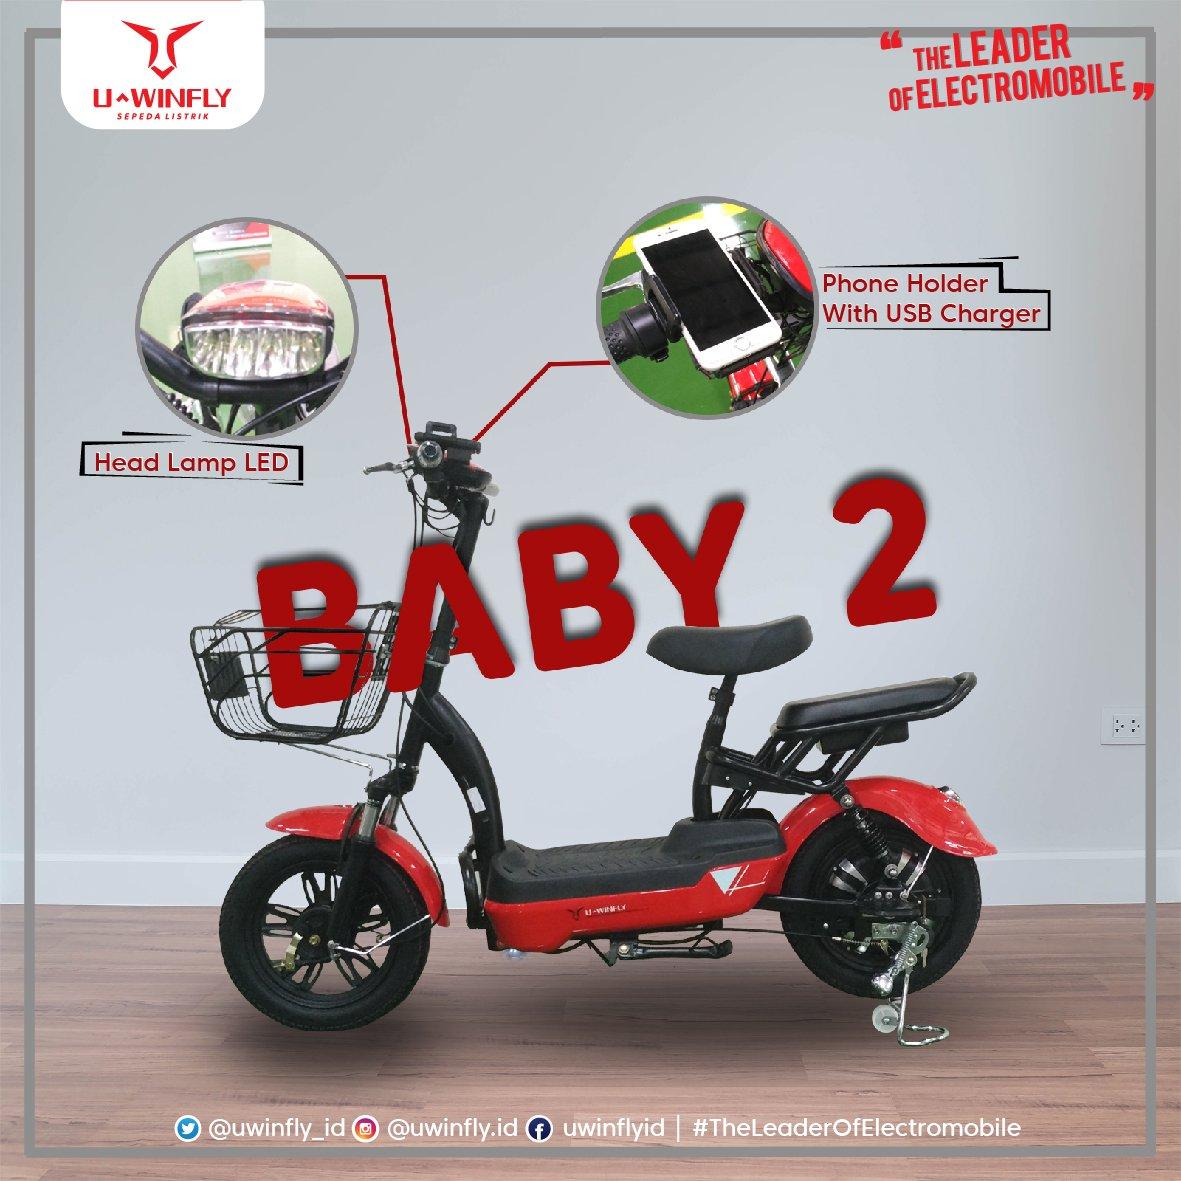 Toko Spare Part Sepeda Motor Suzuki Jakarta | Reviewmotors.co